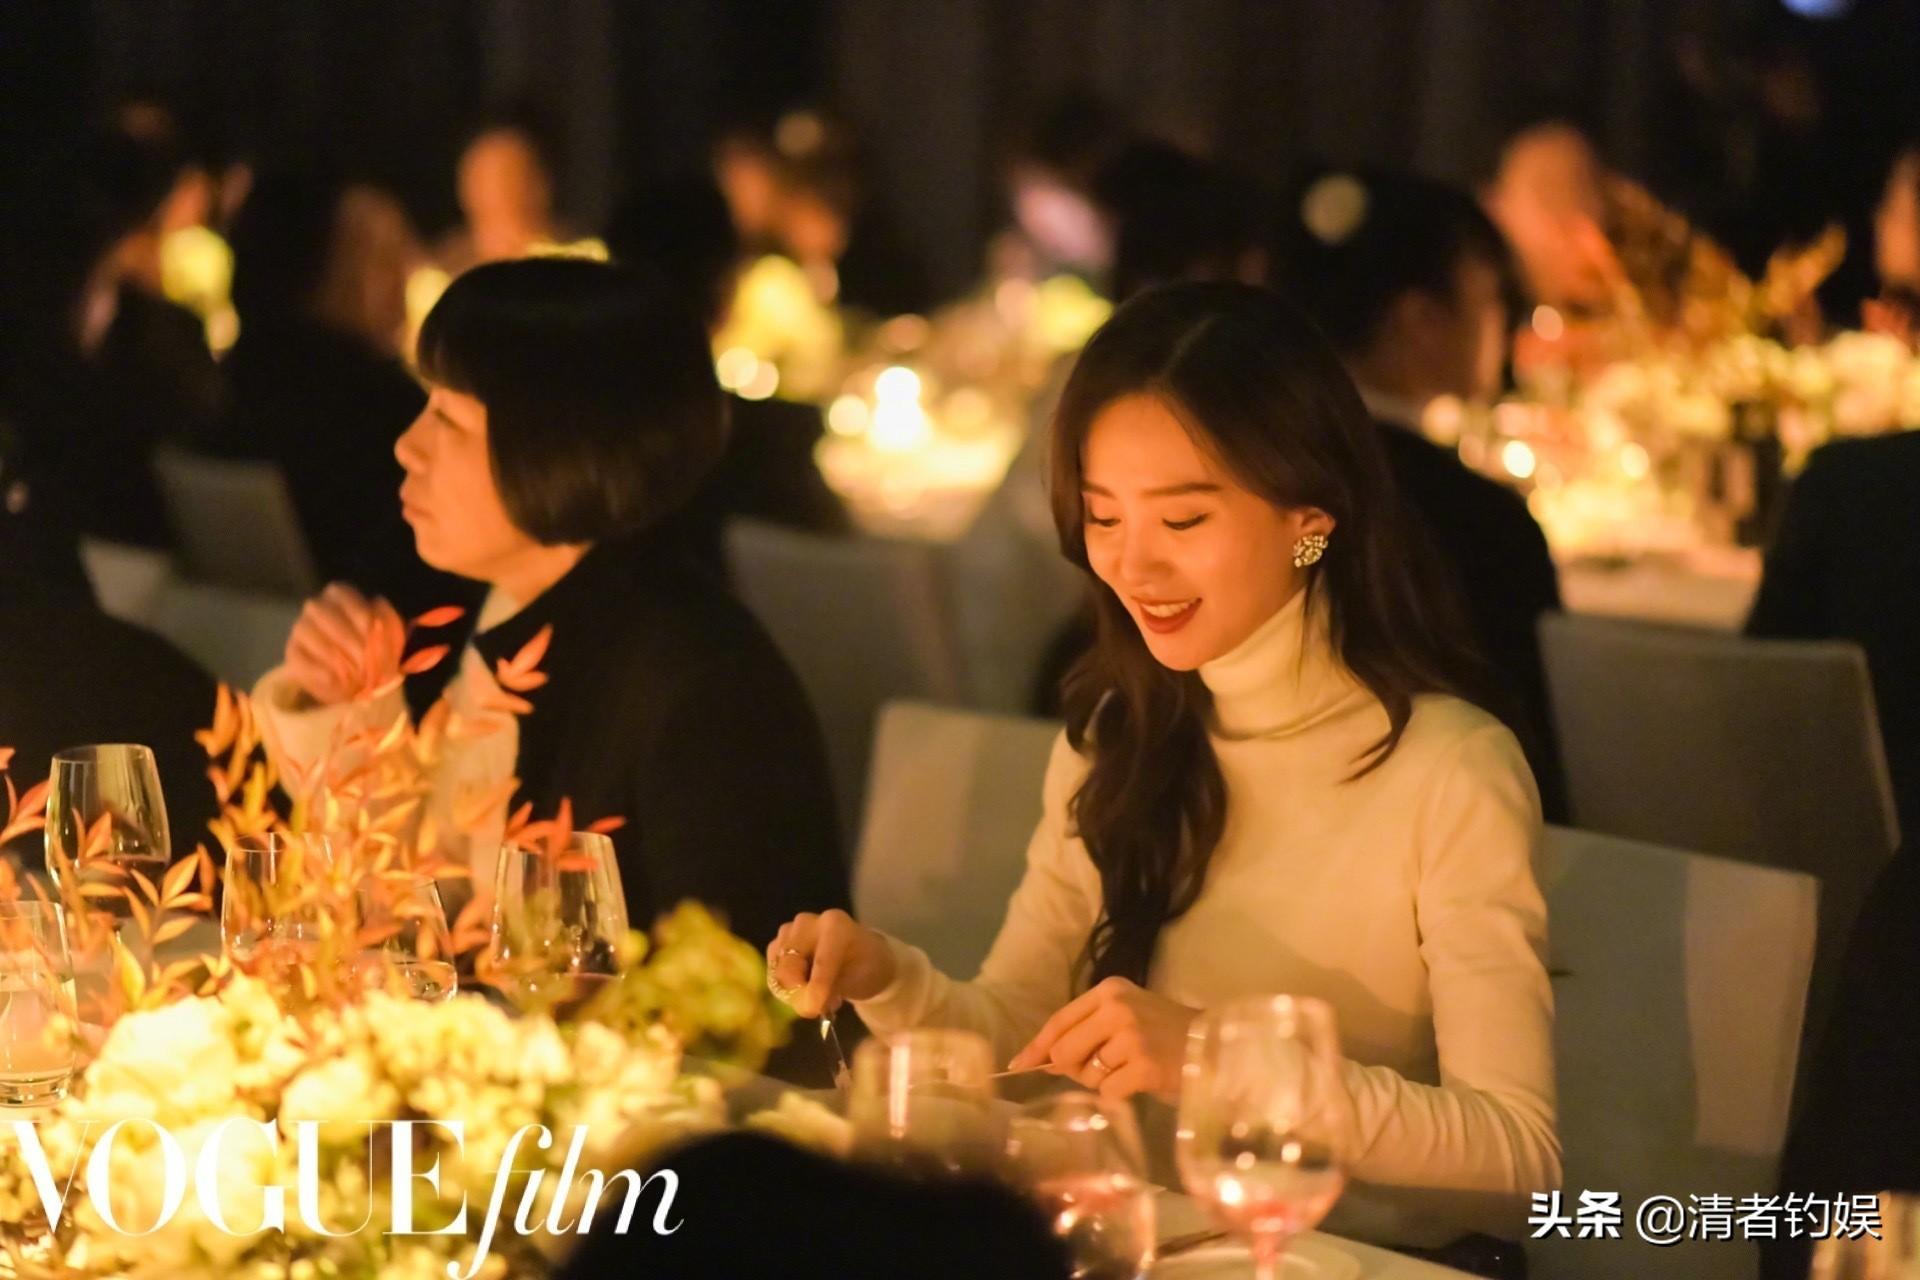 vogue晚宴刘诗诗像小说里的豪门千金,一举一动知性漂亮